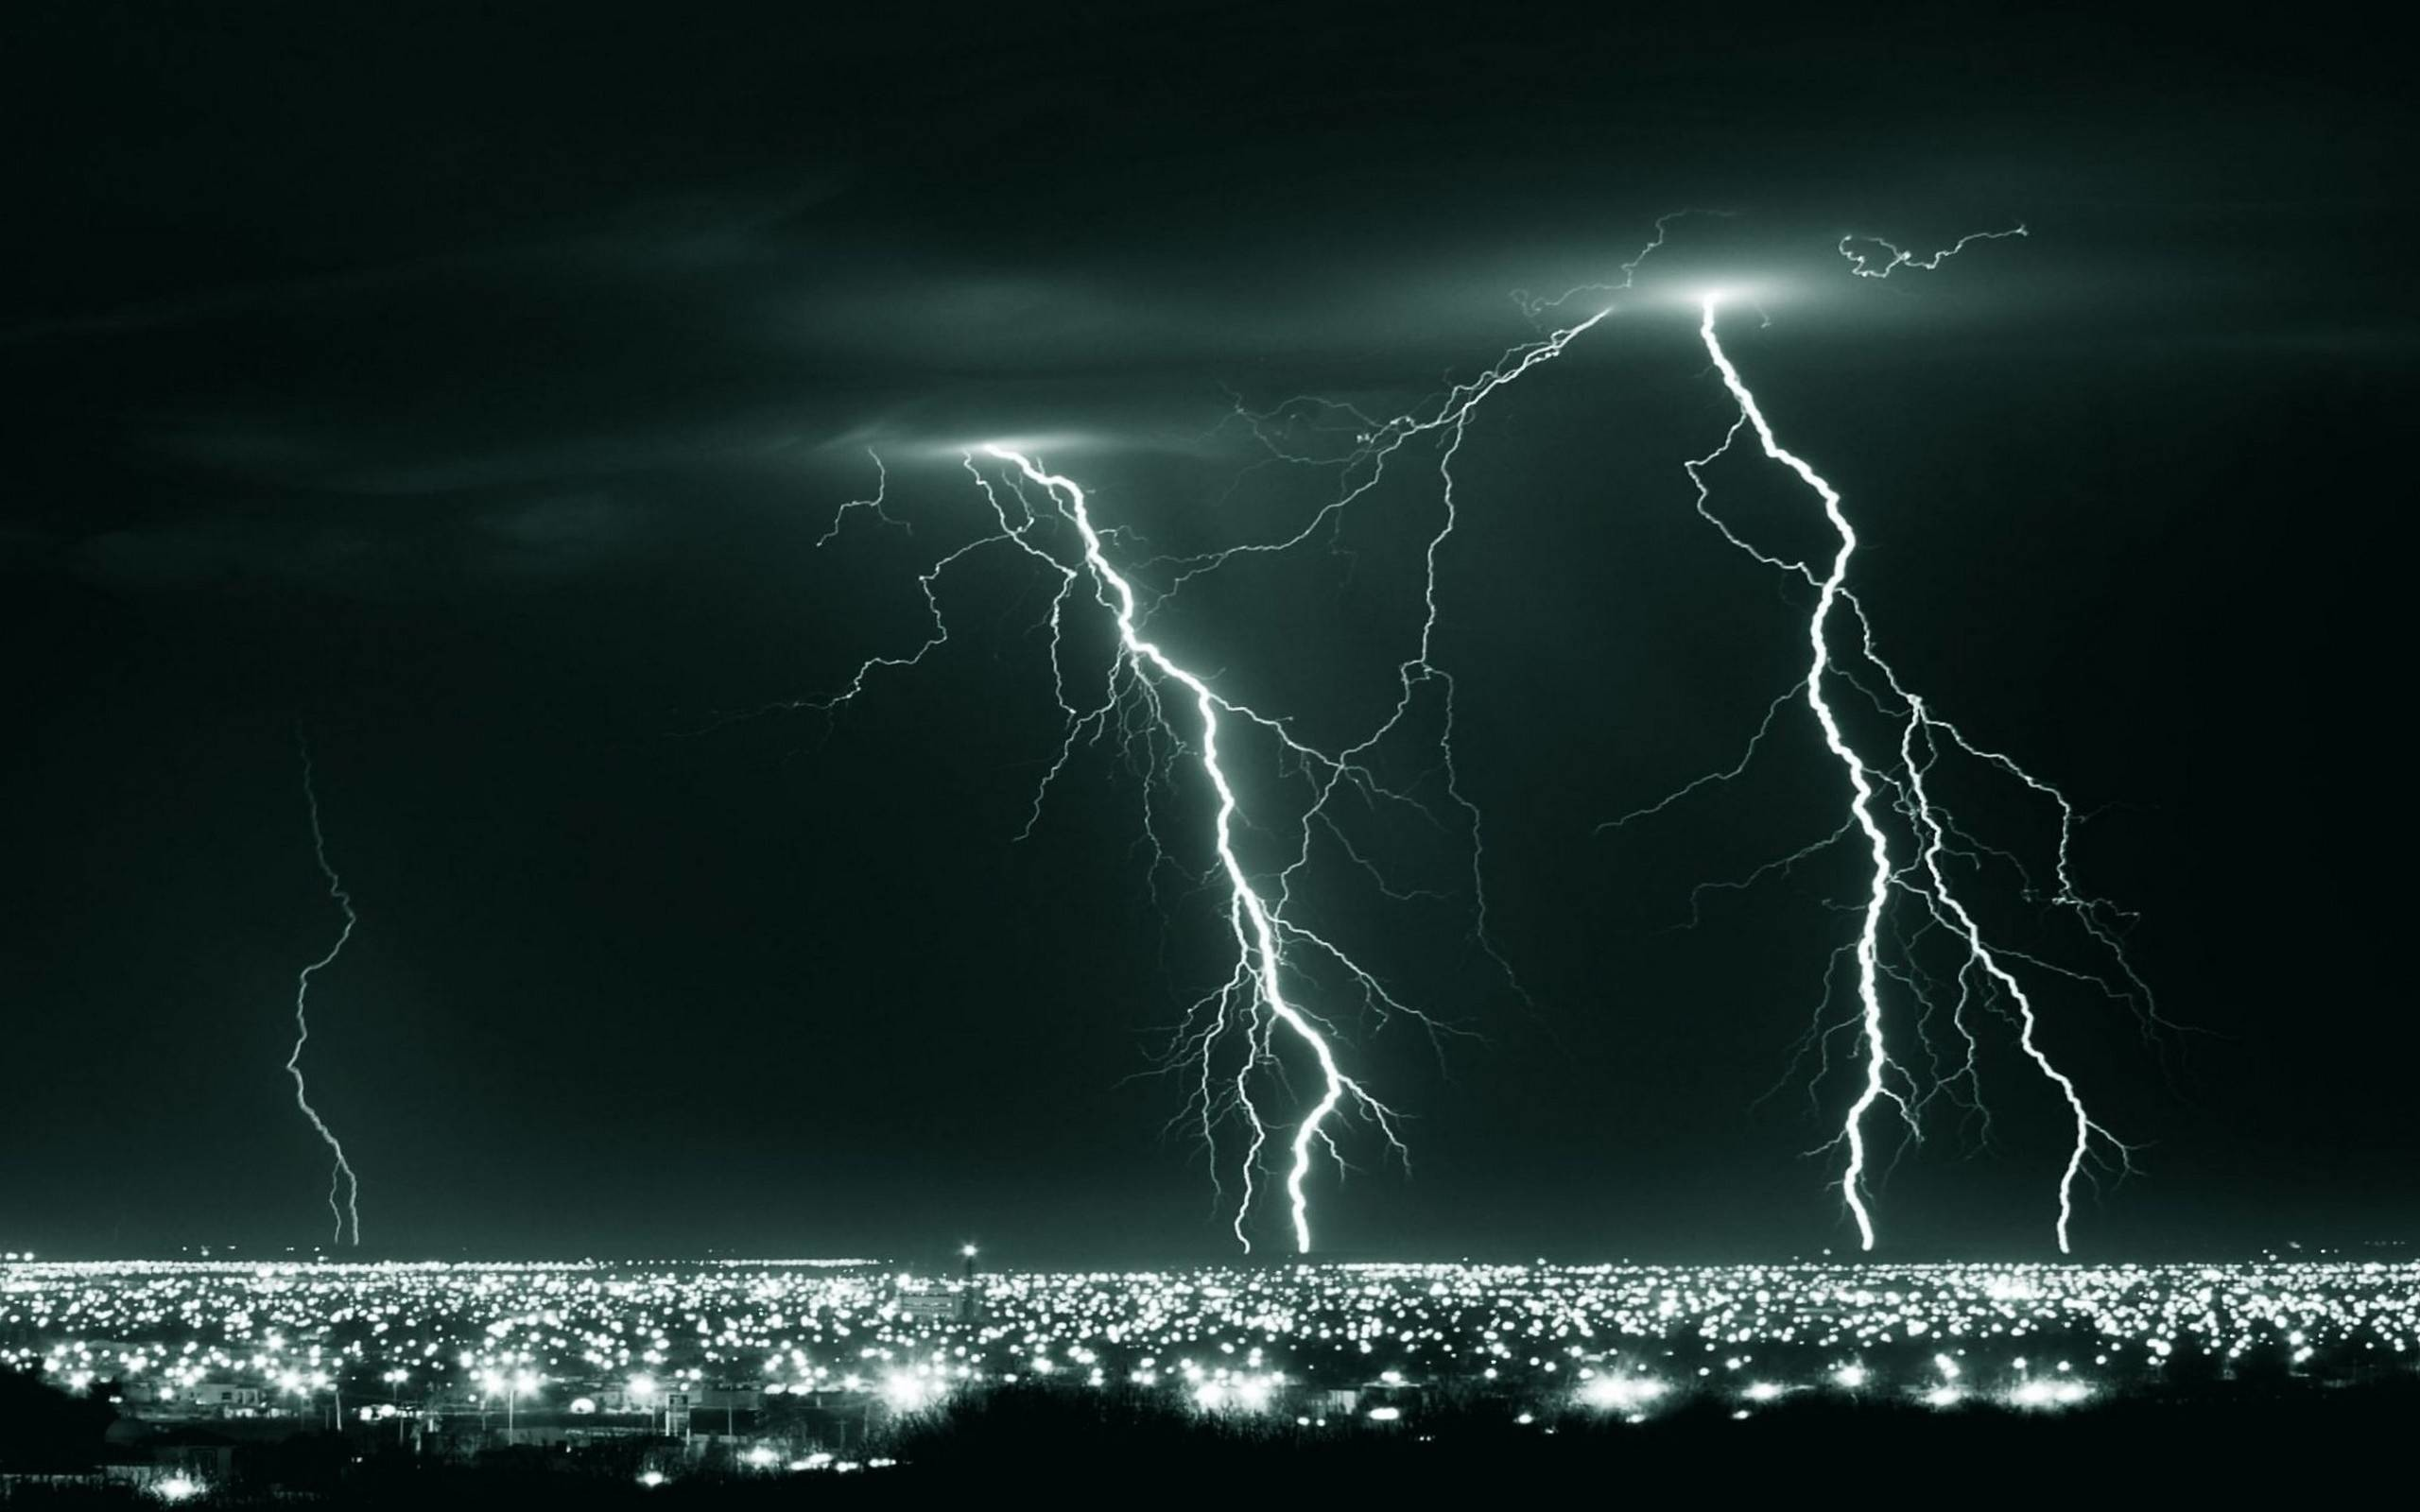 Wallpapers For > Lightning Storm Wallpaper Hd